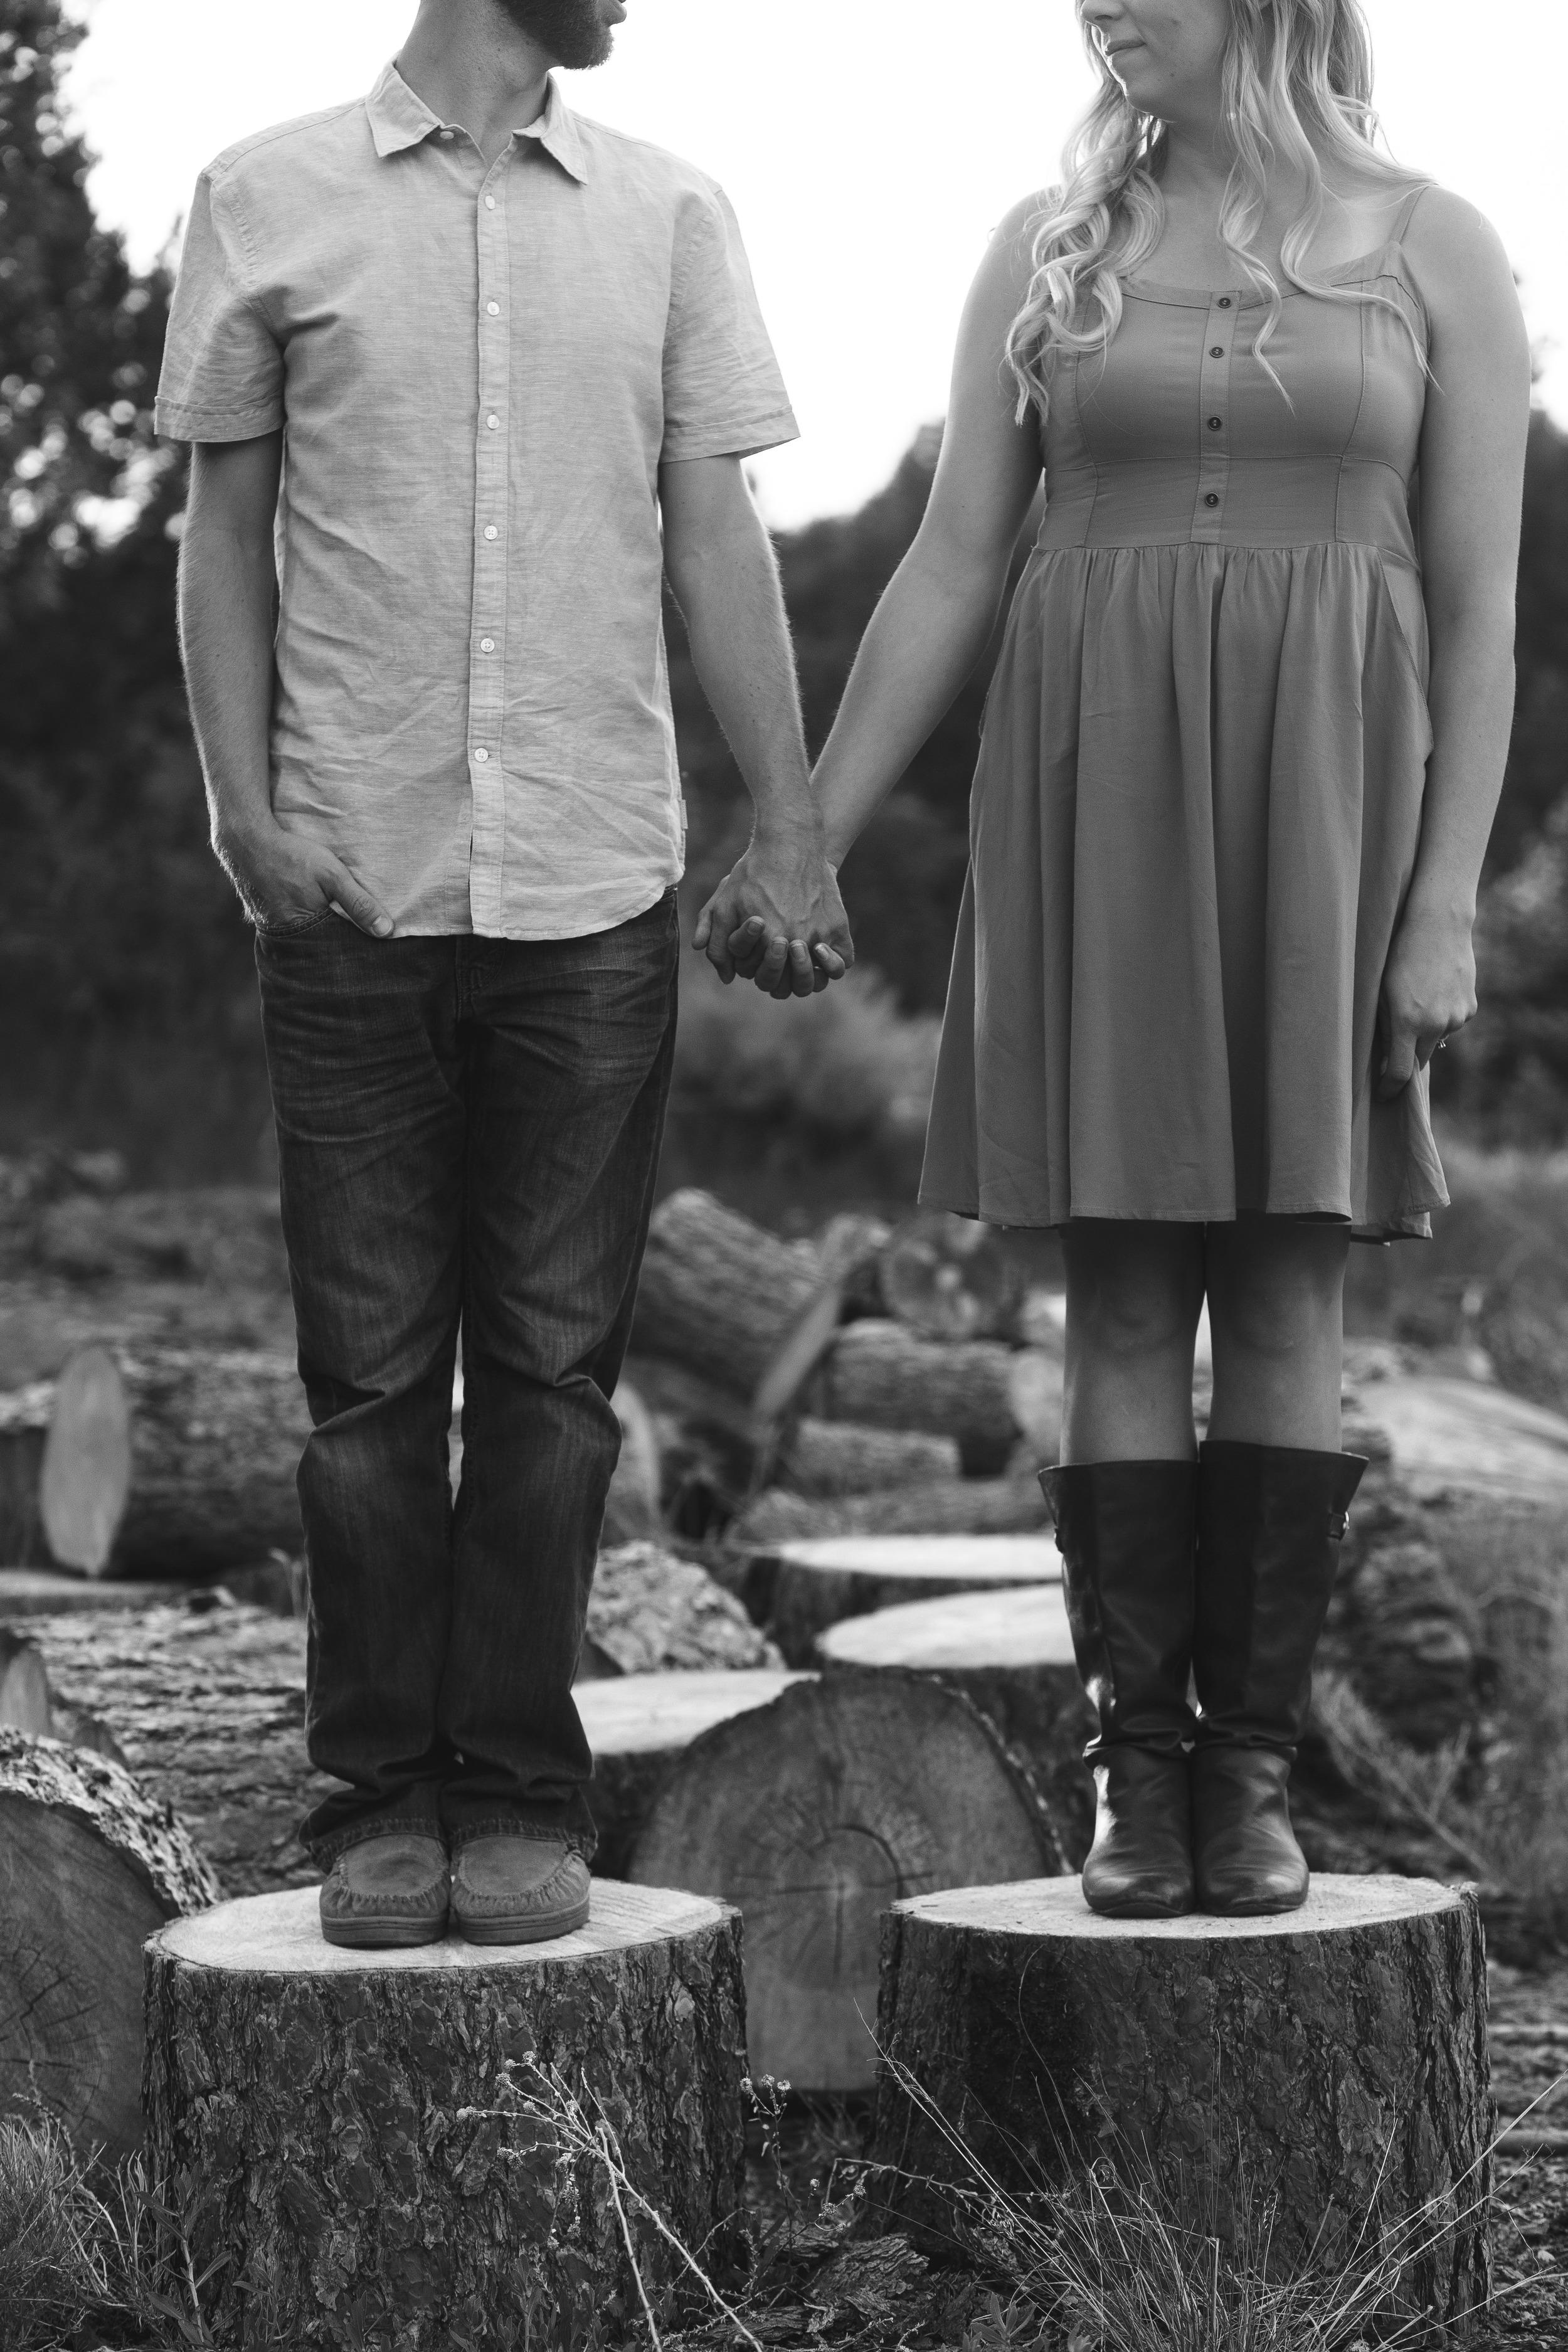 Black and White Faceless Couple Portrait